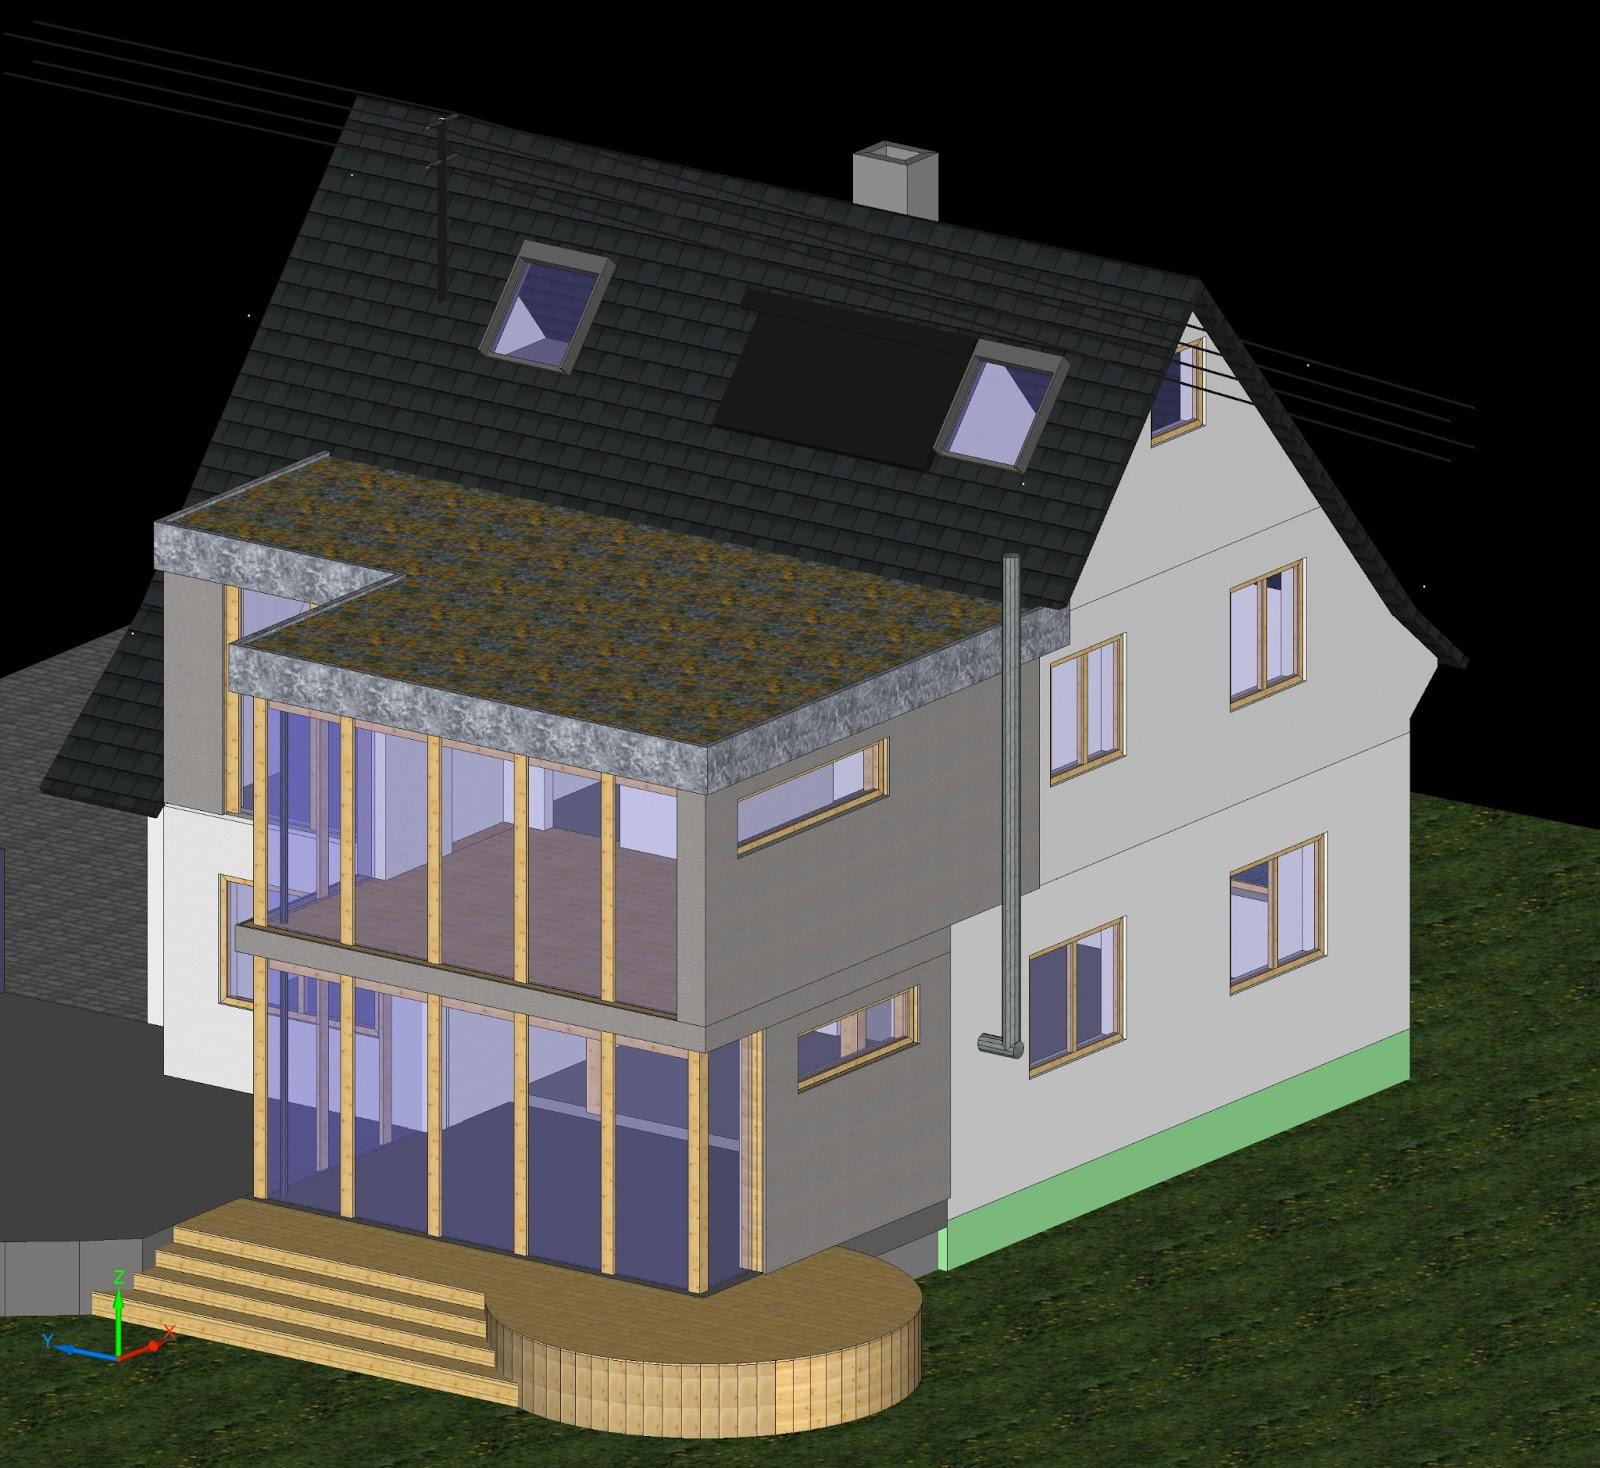 container haus kosten luxus container haus kosten indygo. Black Bedroom Furniture Sets. Home Design Ideas